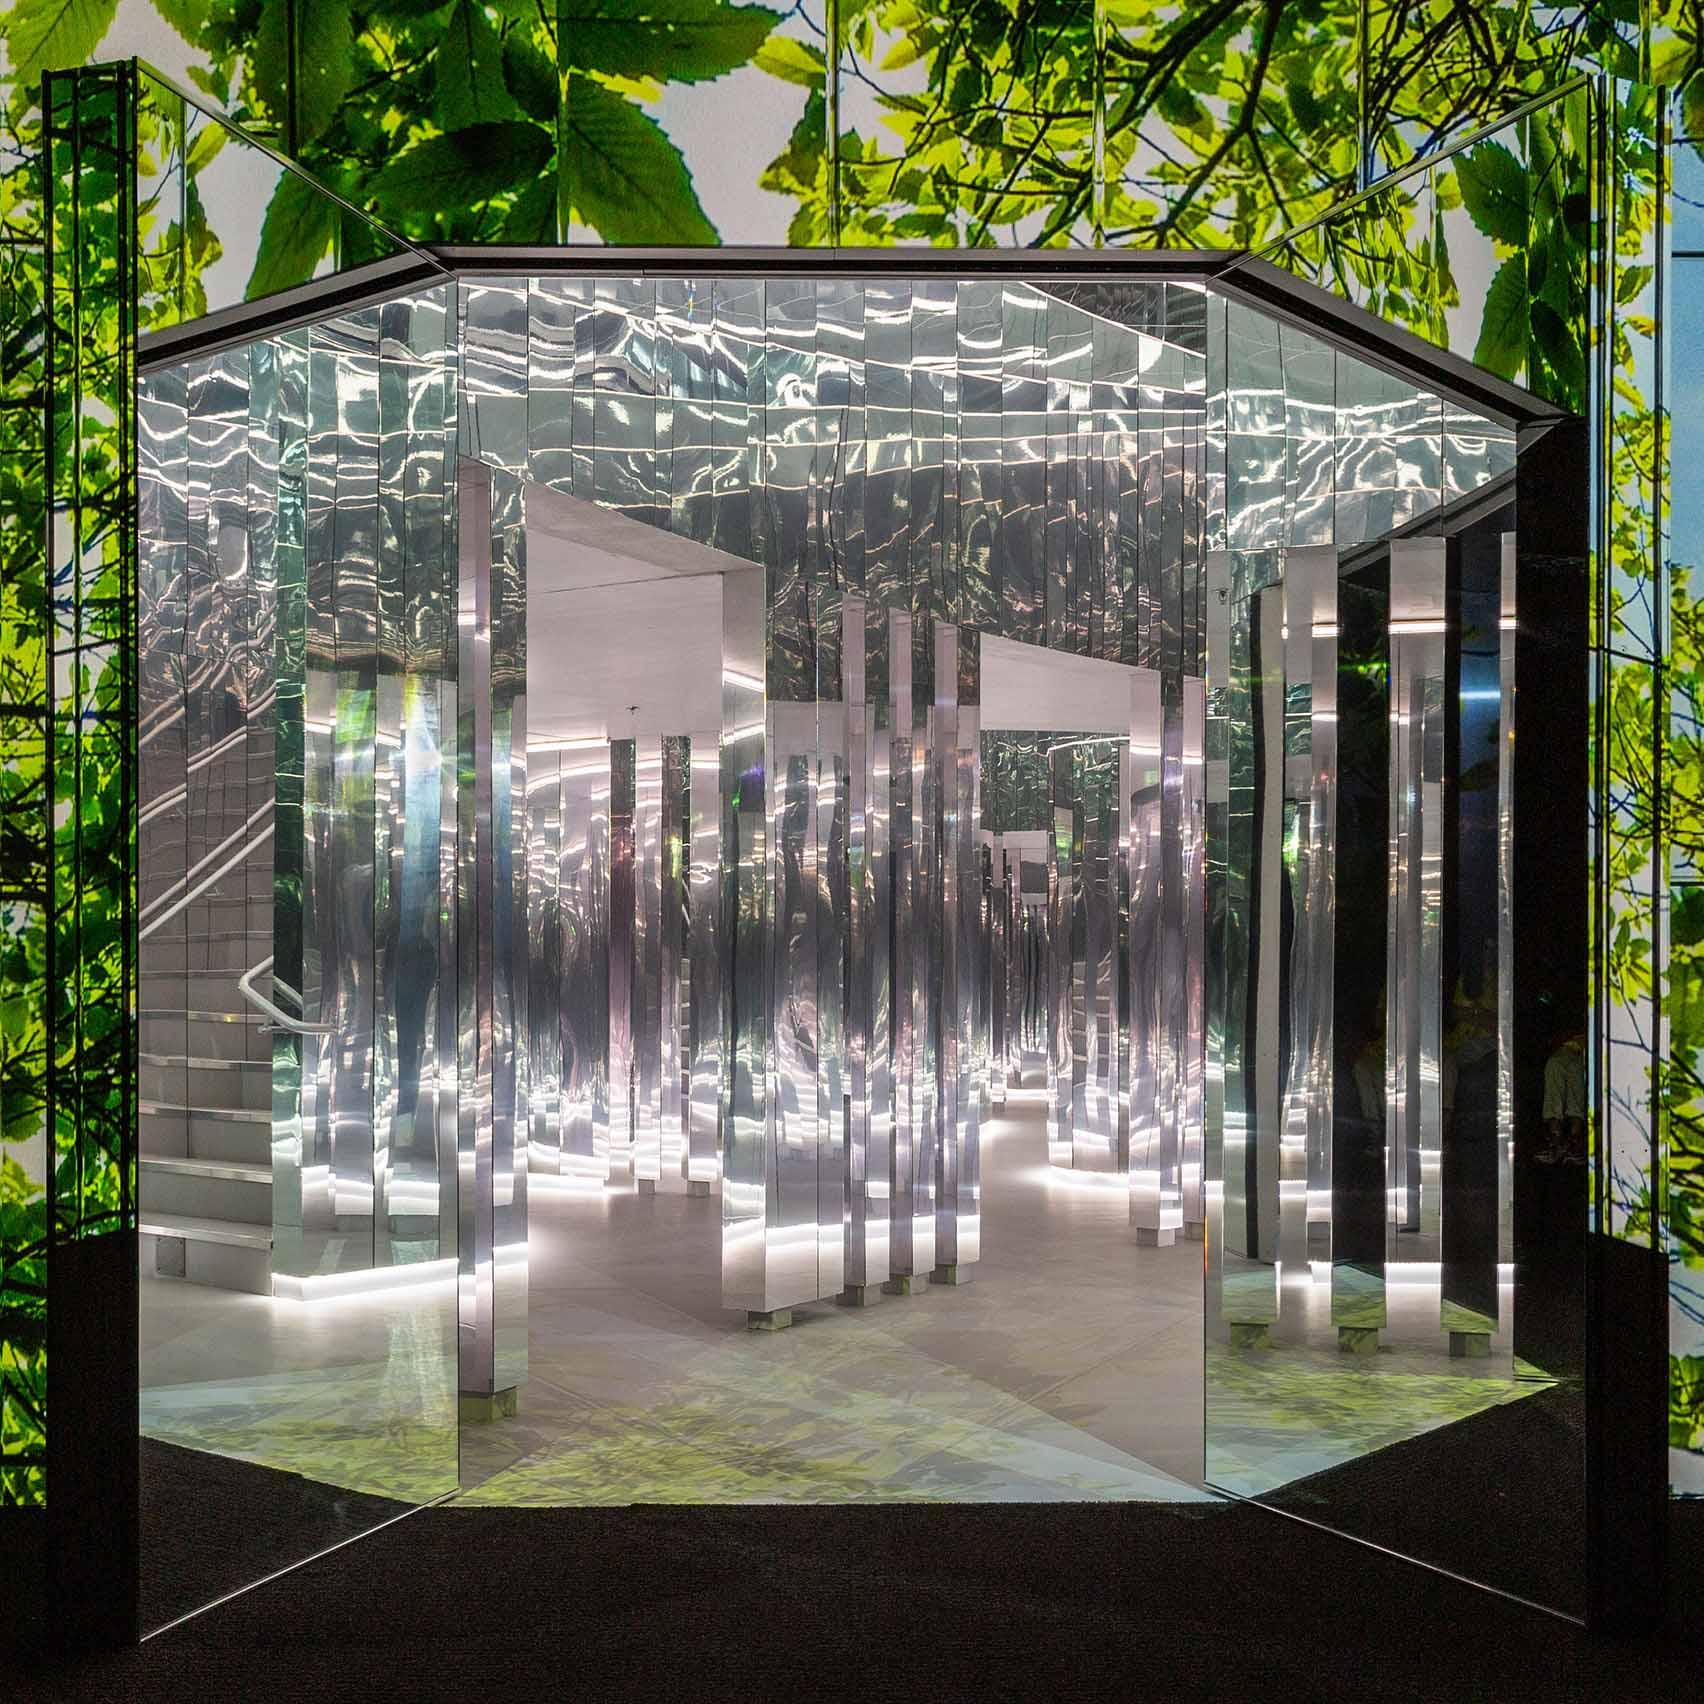 Superblue Miami открывается зеркальной инсталляцией Es Devlin